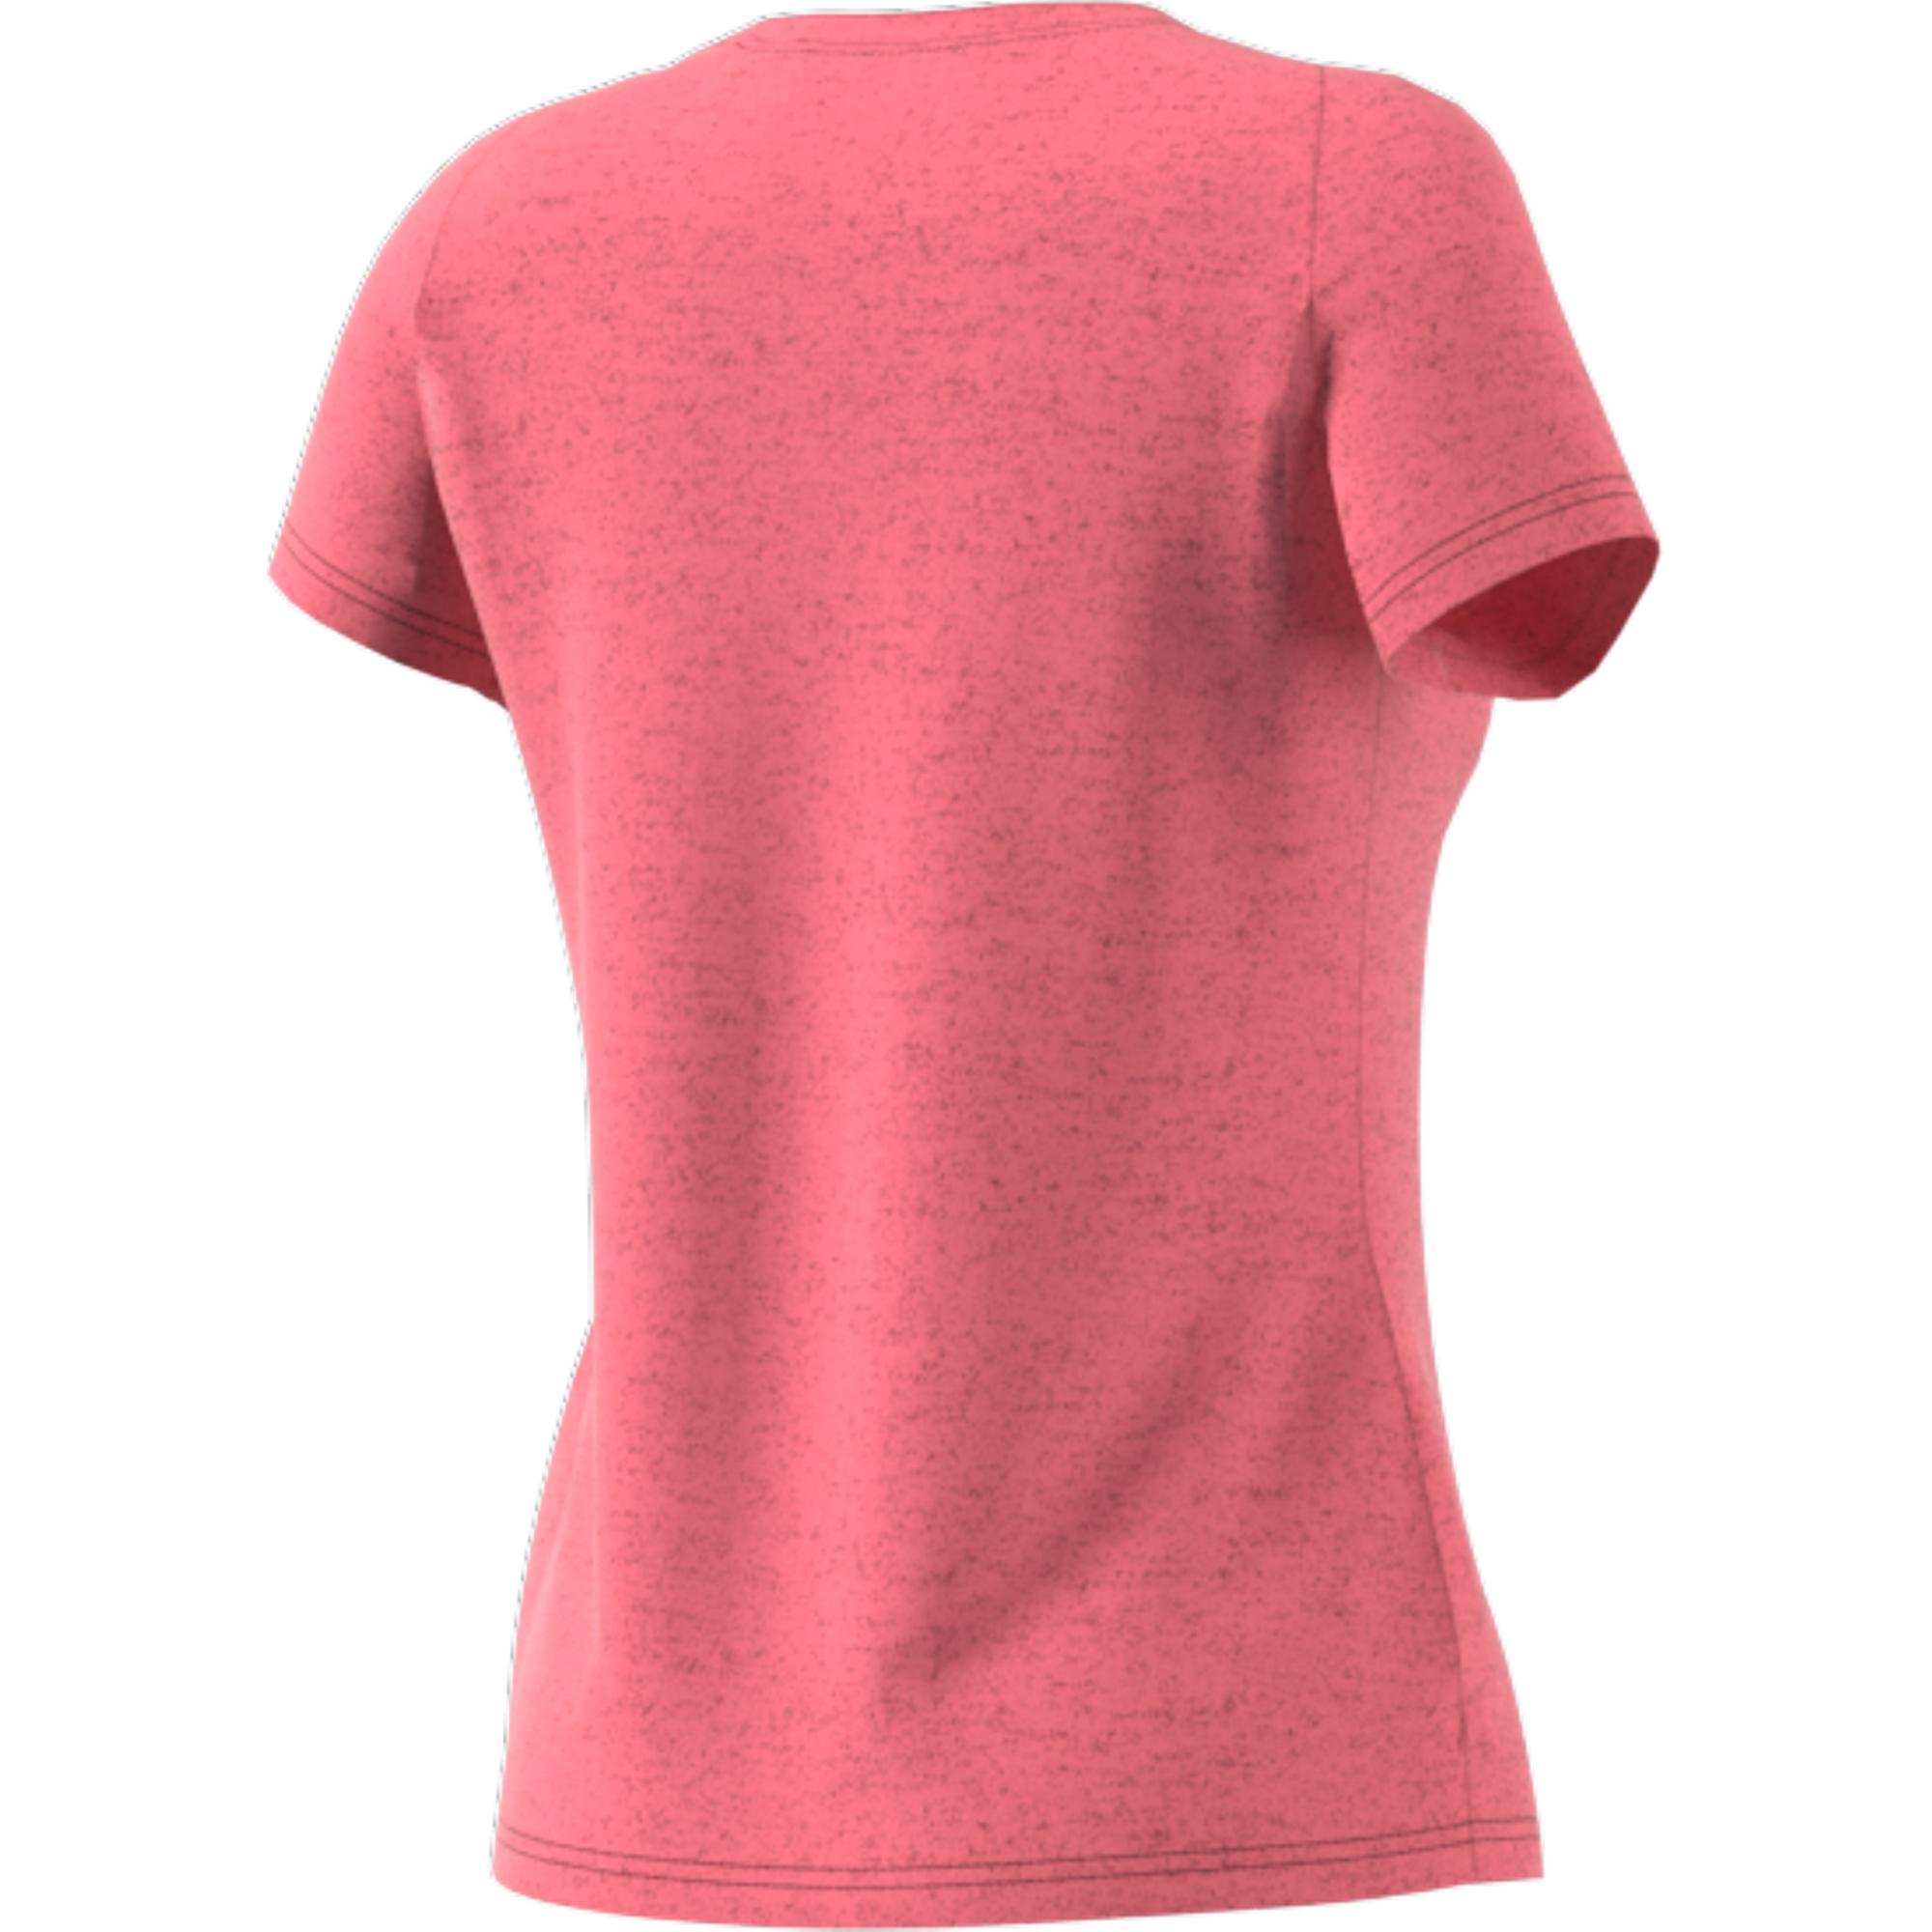 Women's Short Sleeve Winners Tee, Pink, swatch